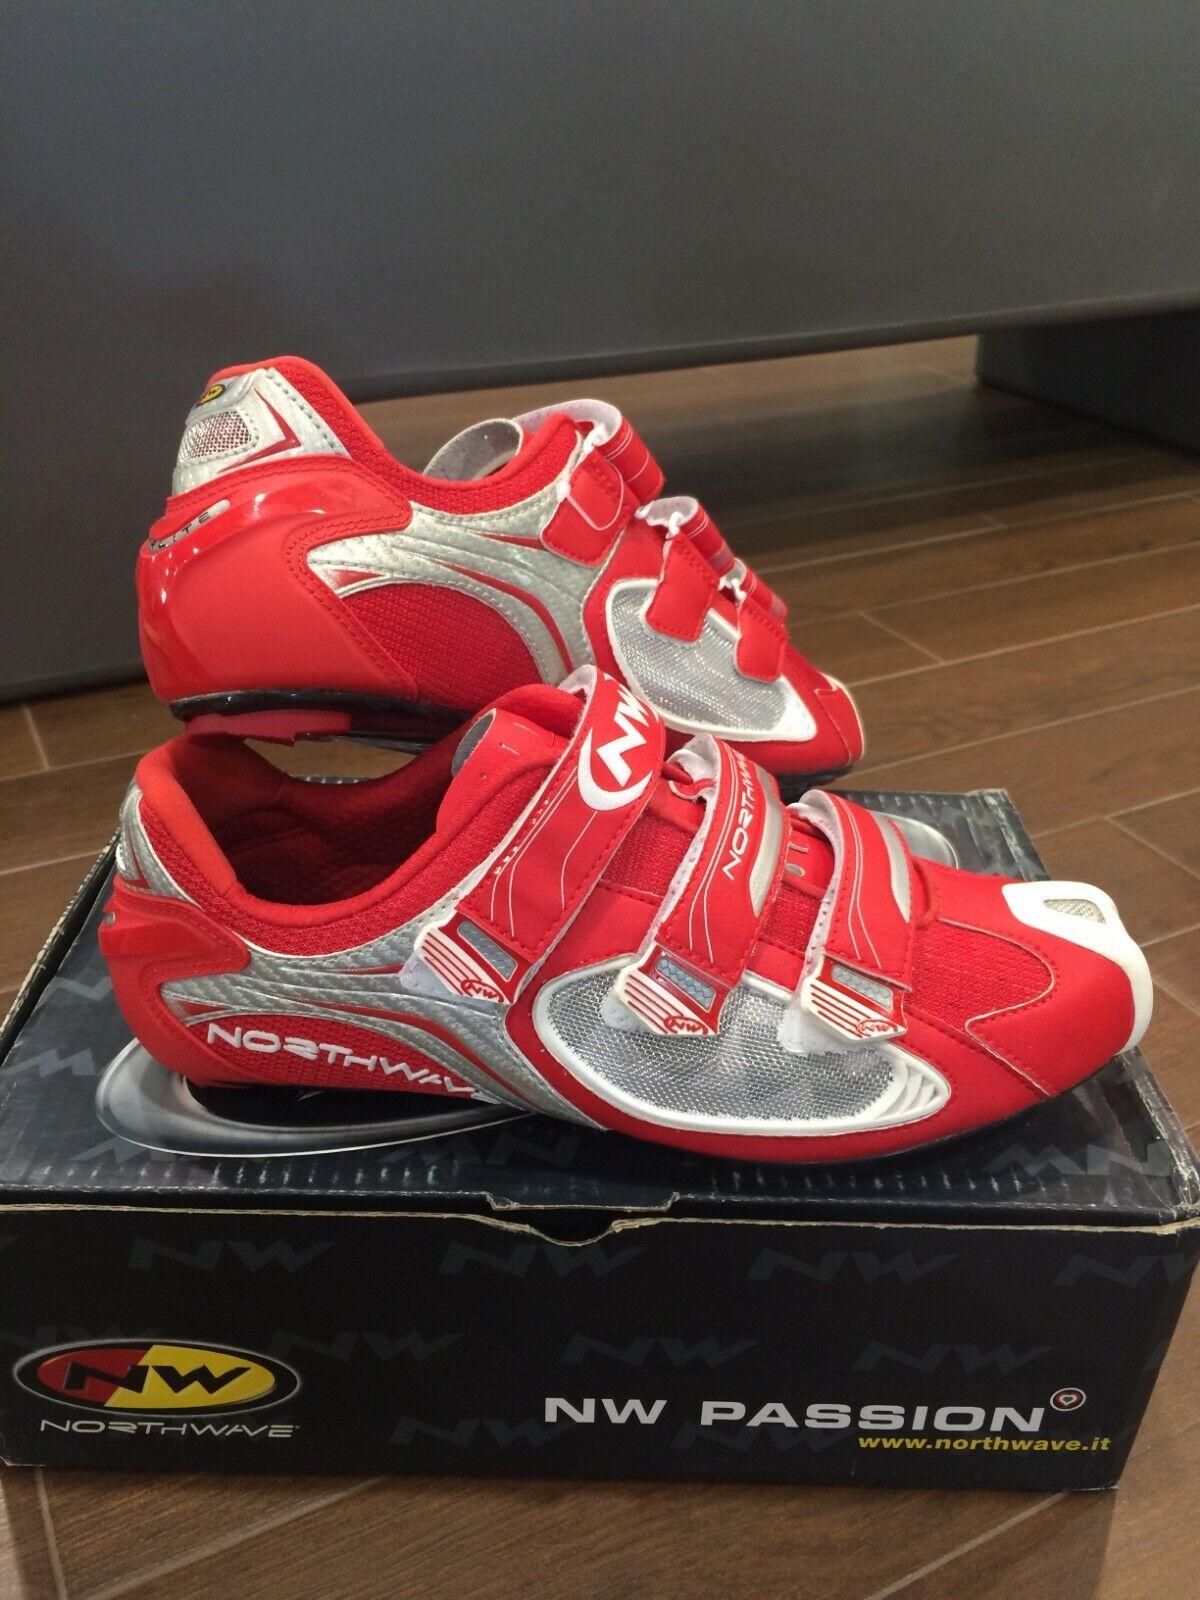 zapatos NORTHWAVE AERLITE 3 rojo (MISURA 43 - 45)